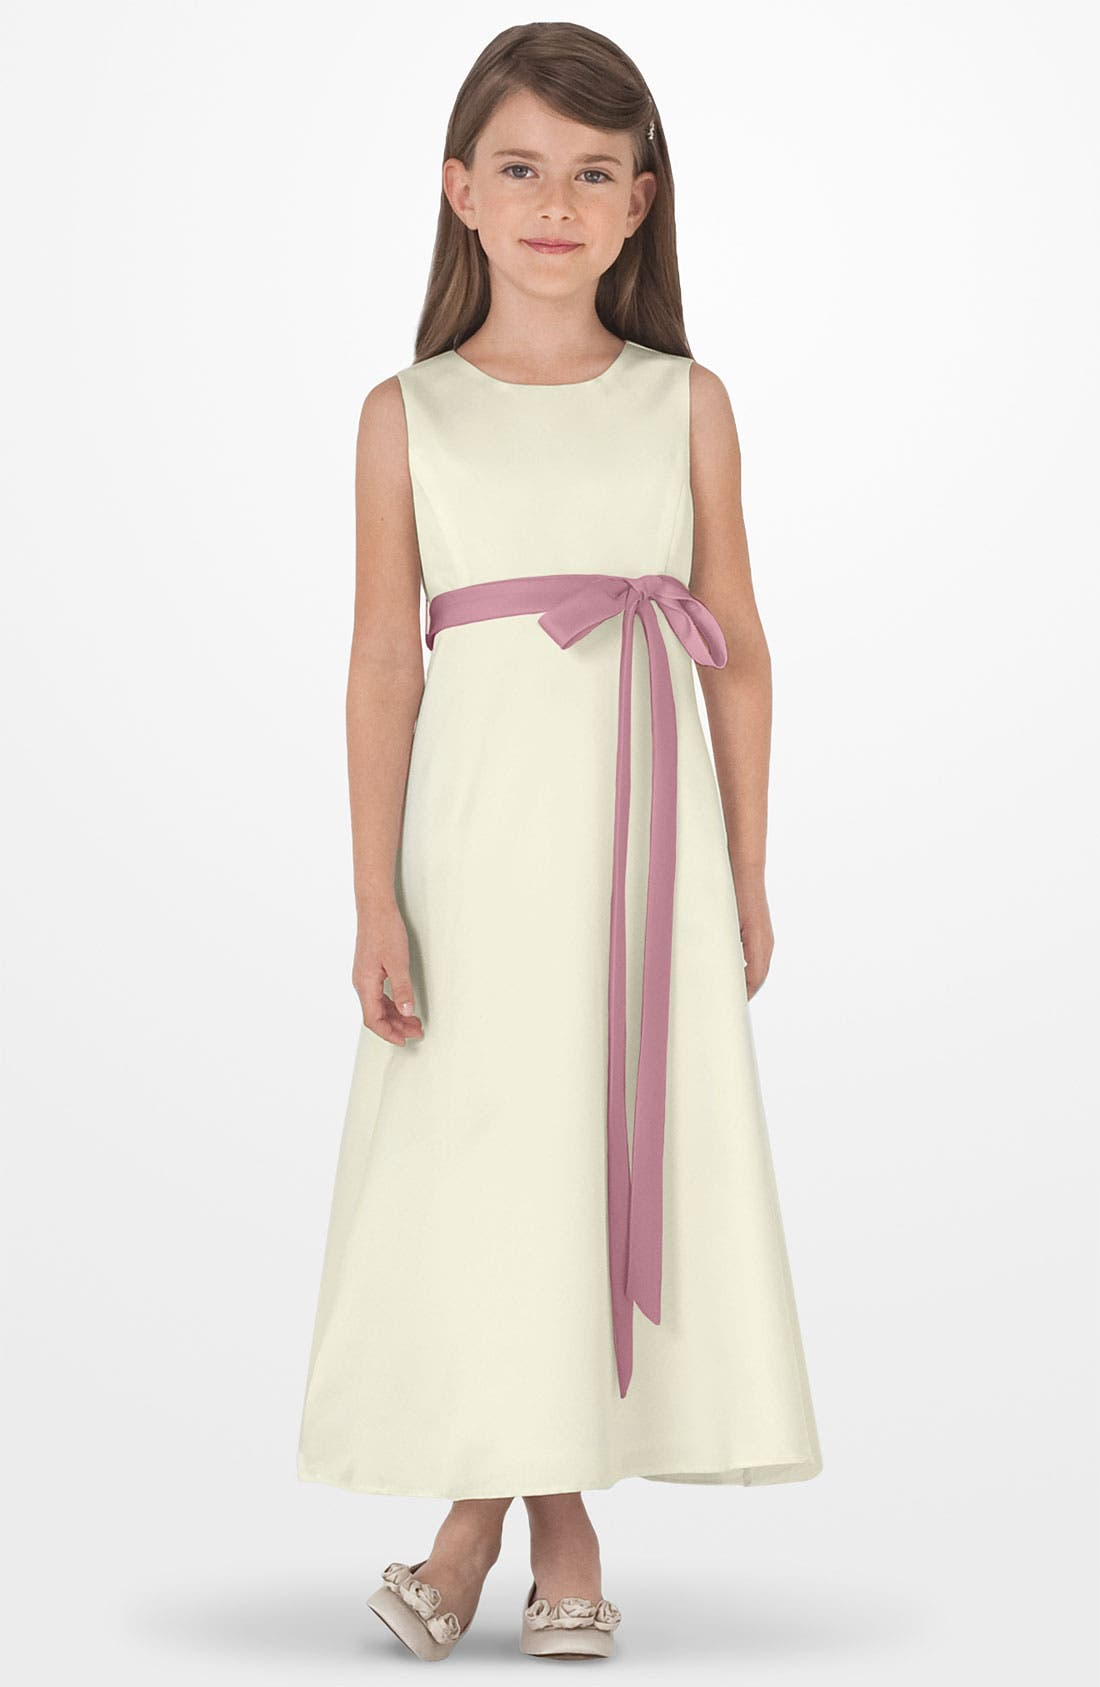 Sleeveless Satin Dress,                         Main,                         color, Ivory/ rose petal